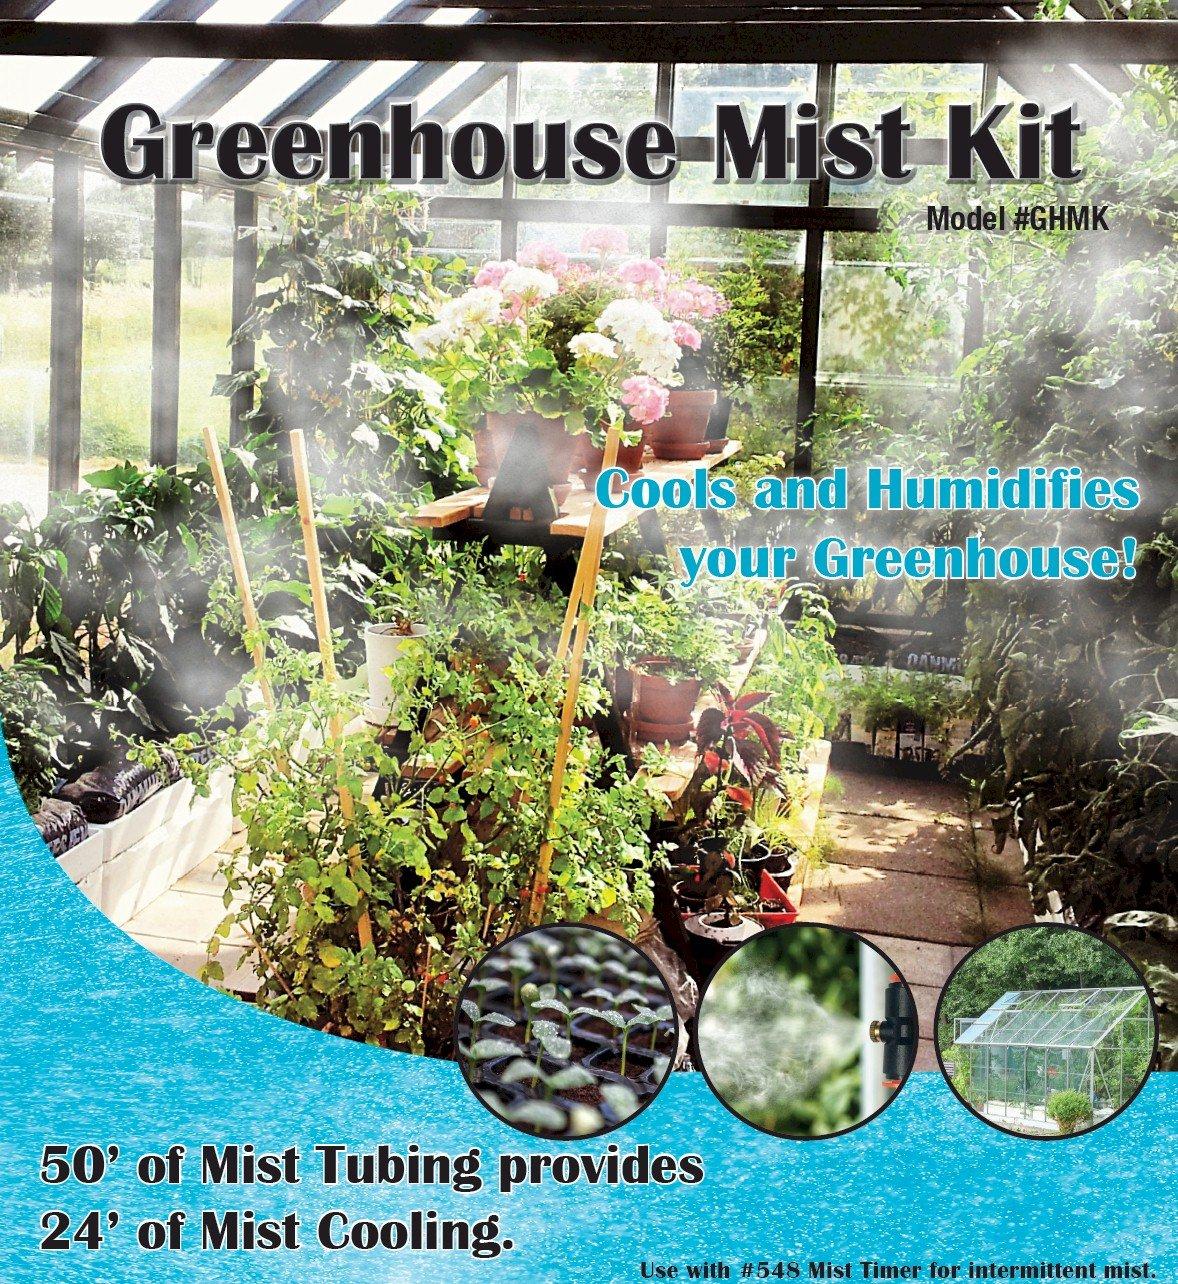 Greenhouse Mist KitGreenhouse Mist Kit